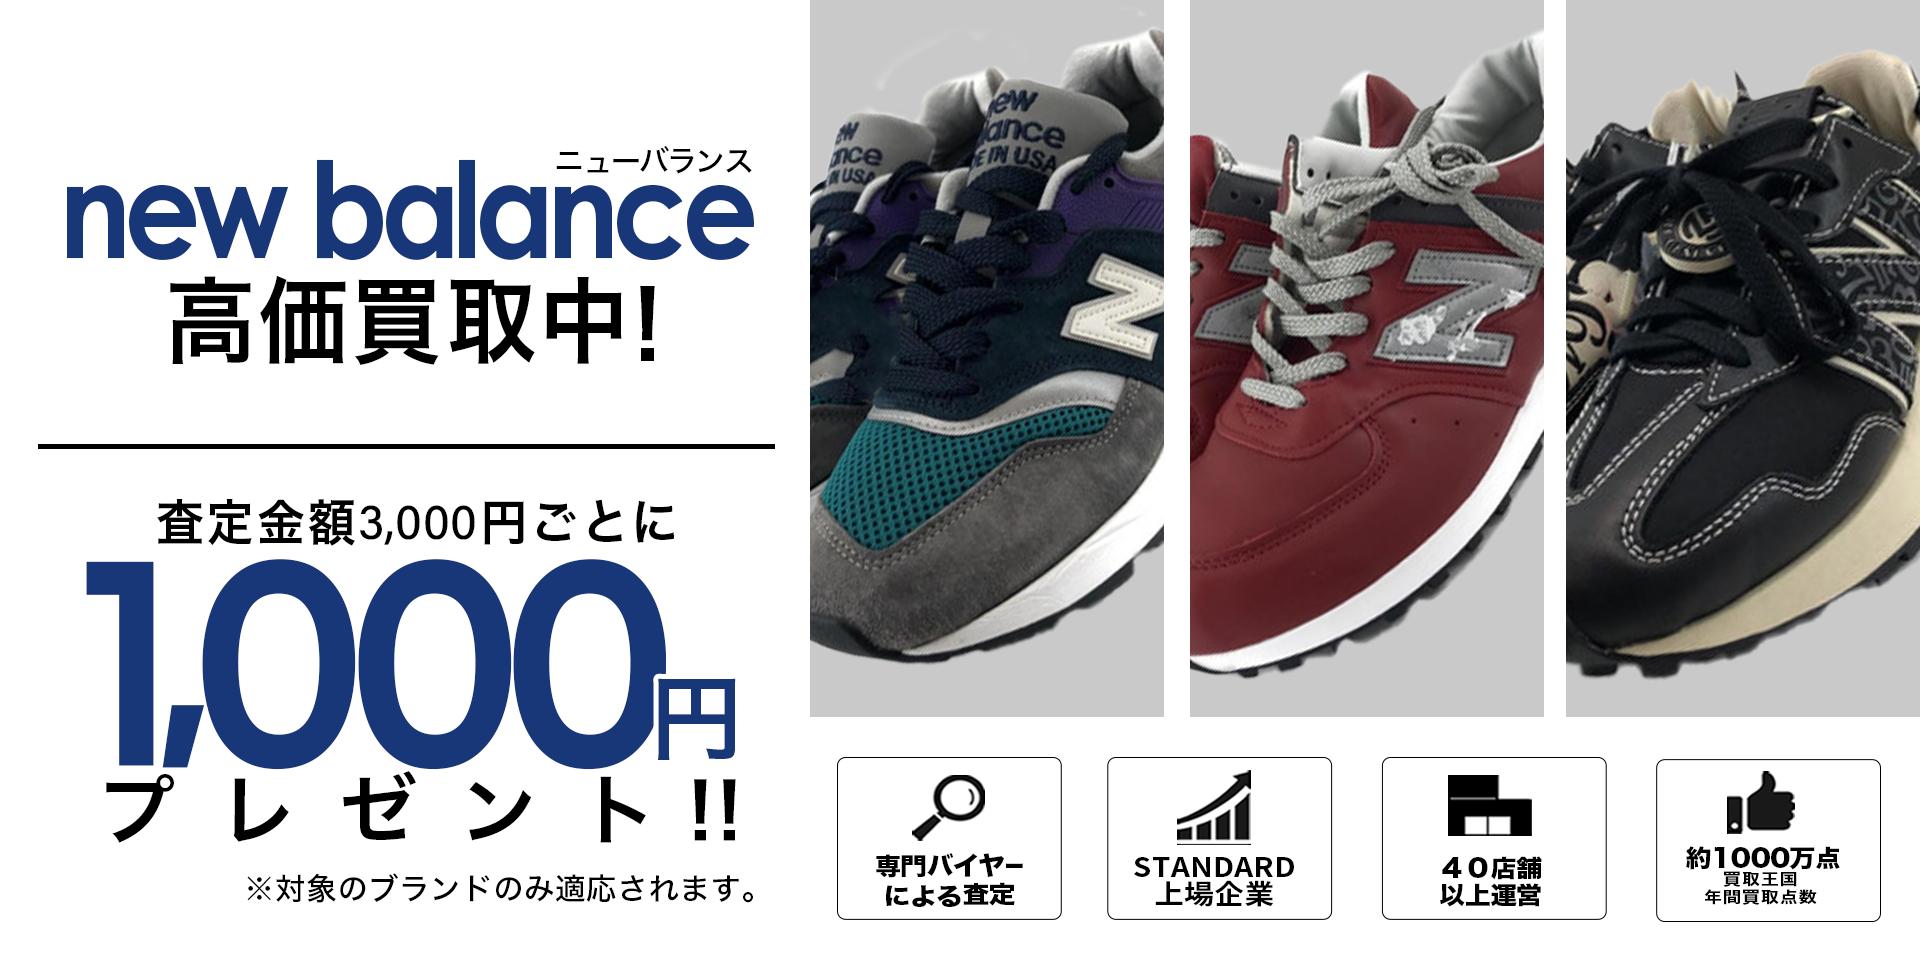 new balanceのキービジュアル